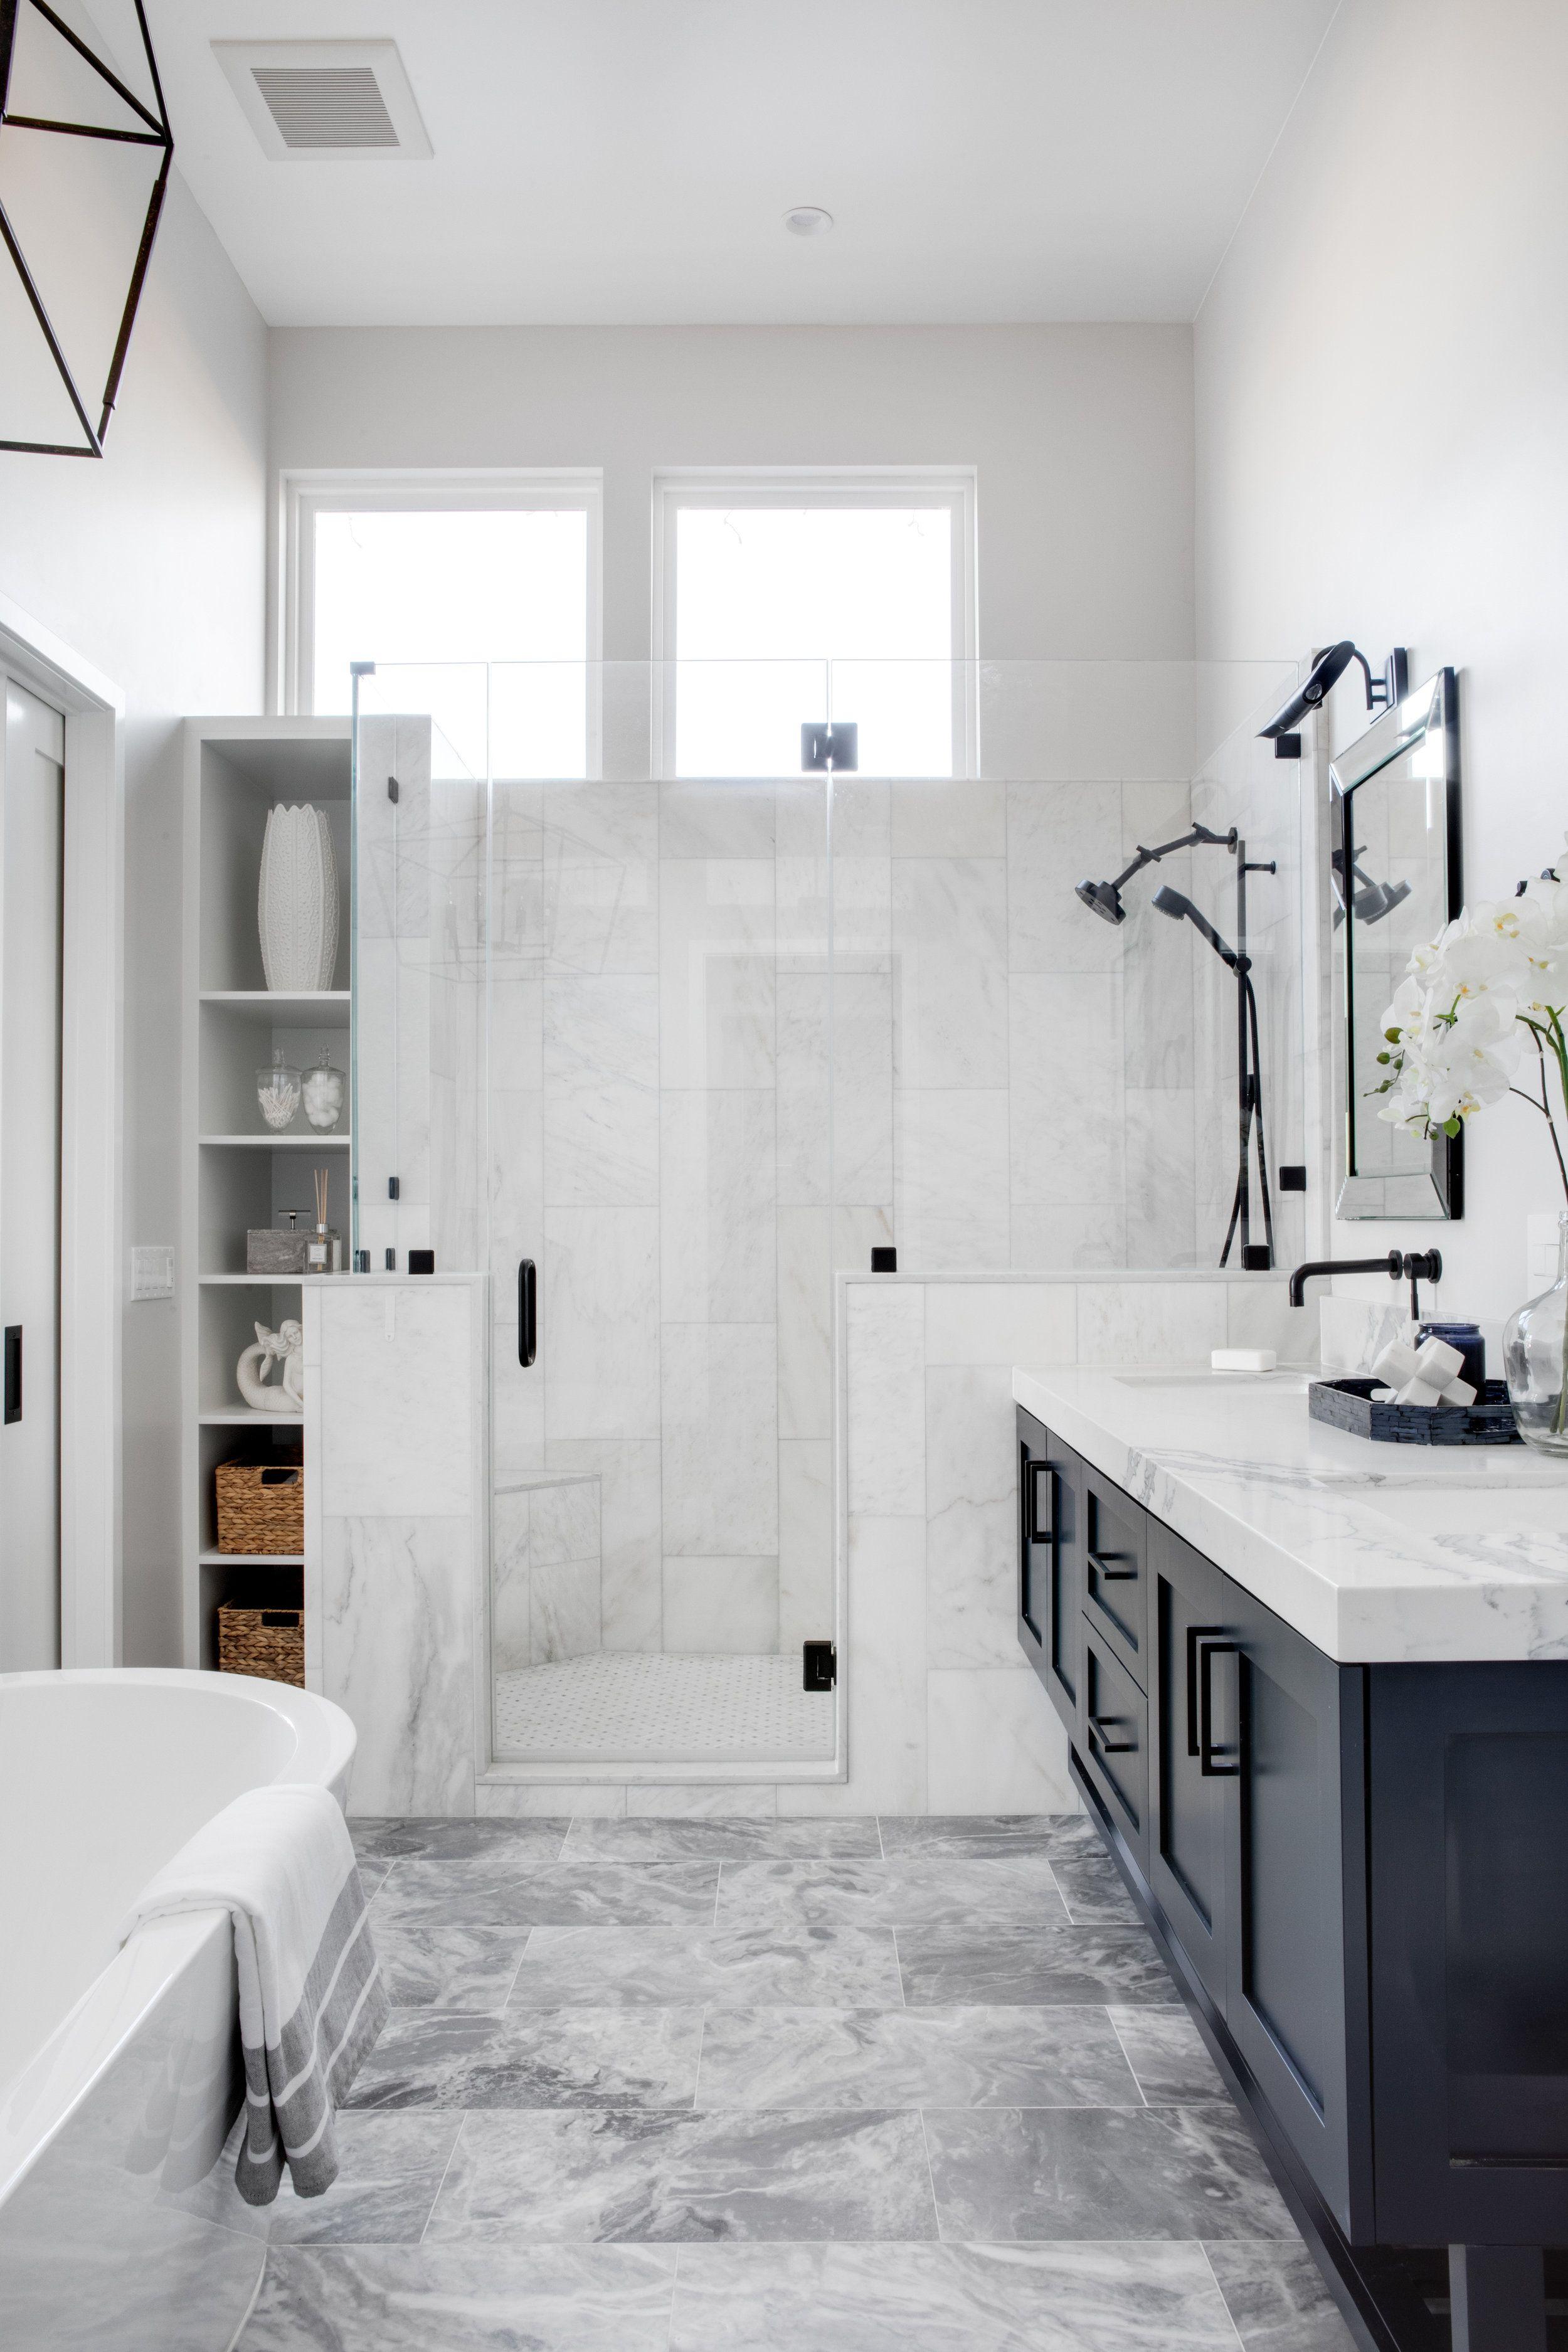 Interior Image By Estera On Bedroom Design Ideas Design